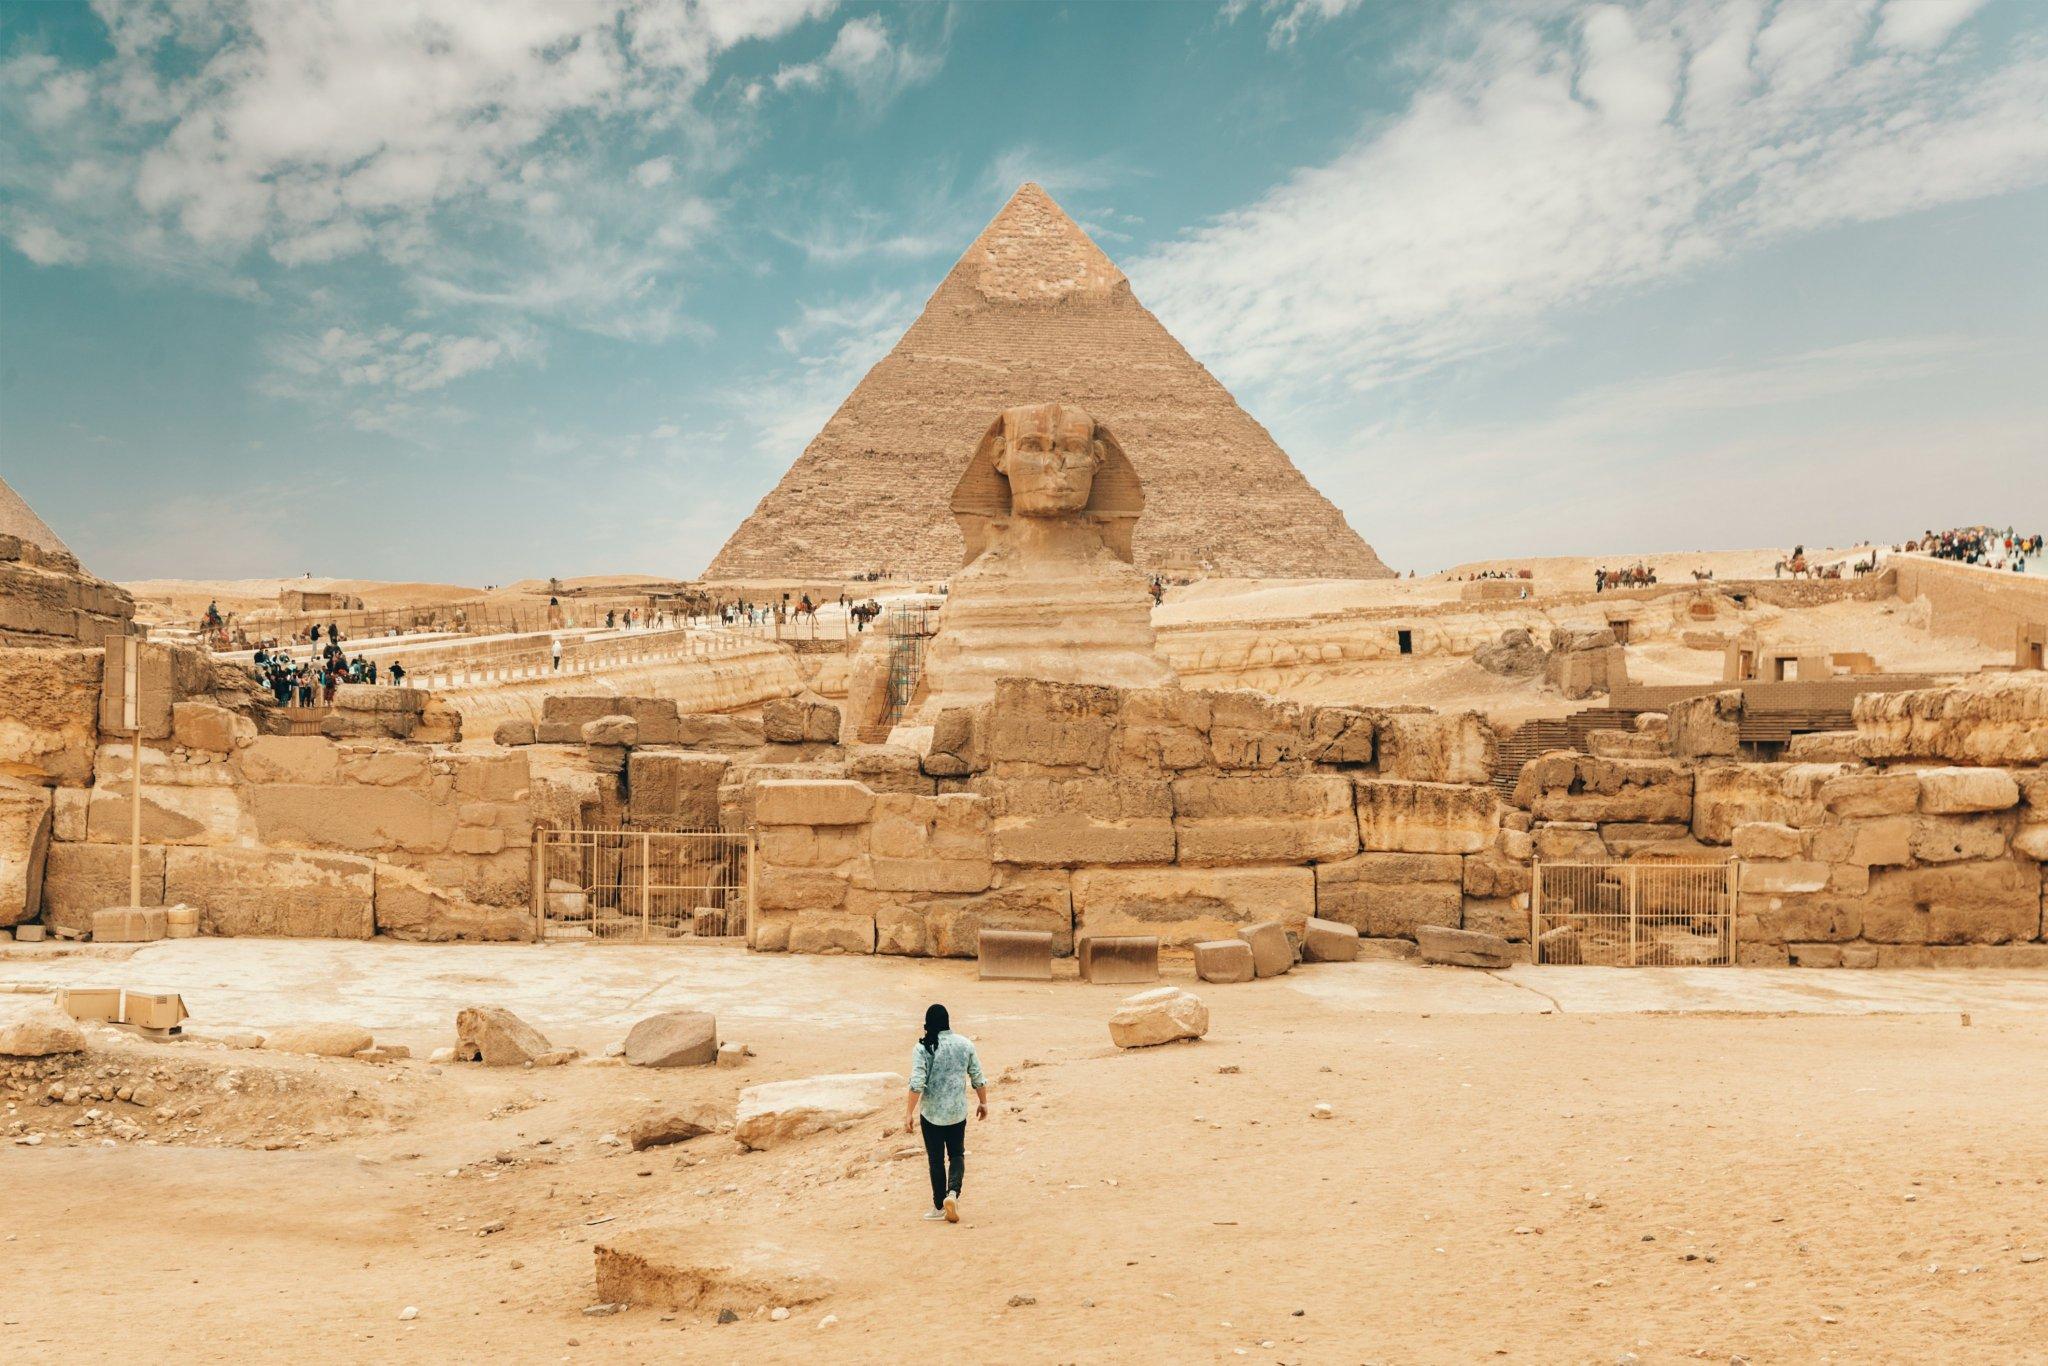 @PicPublic Beautiful photo 🌸 Giza Pyramid https://t.co/HQFW8RY0Ls